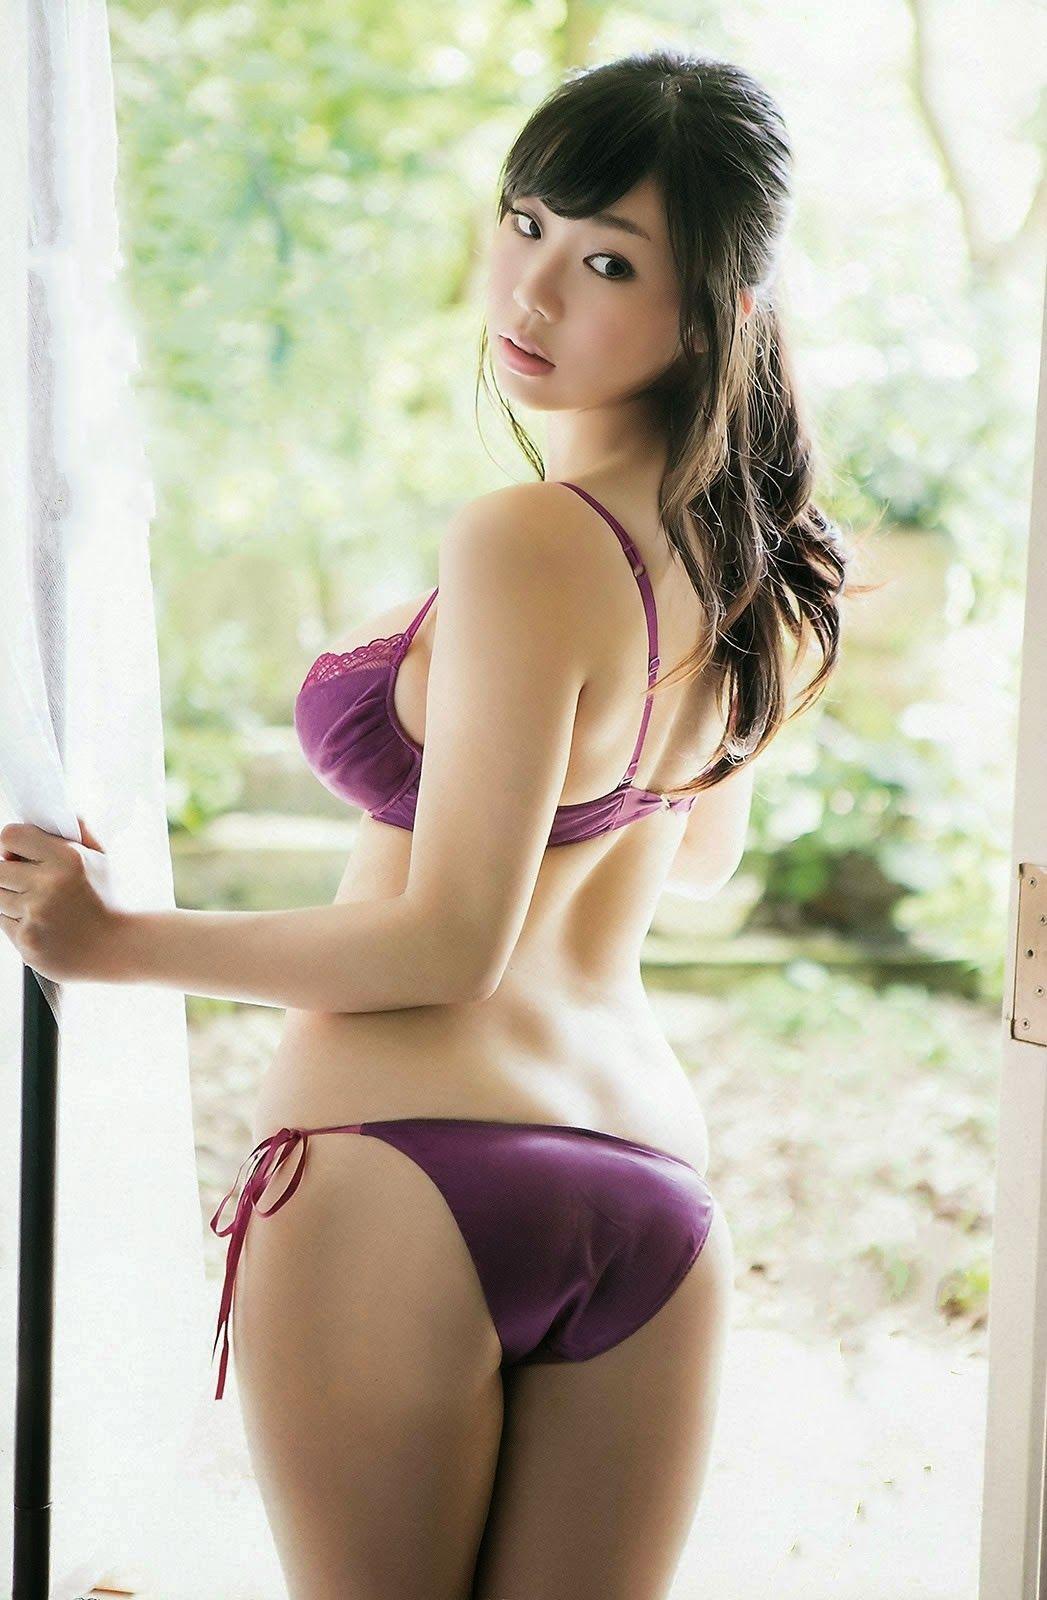 Samll tits and ebony panties